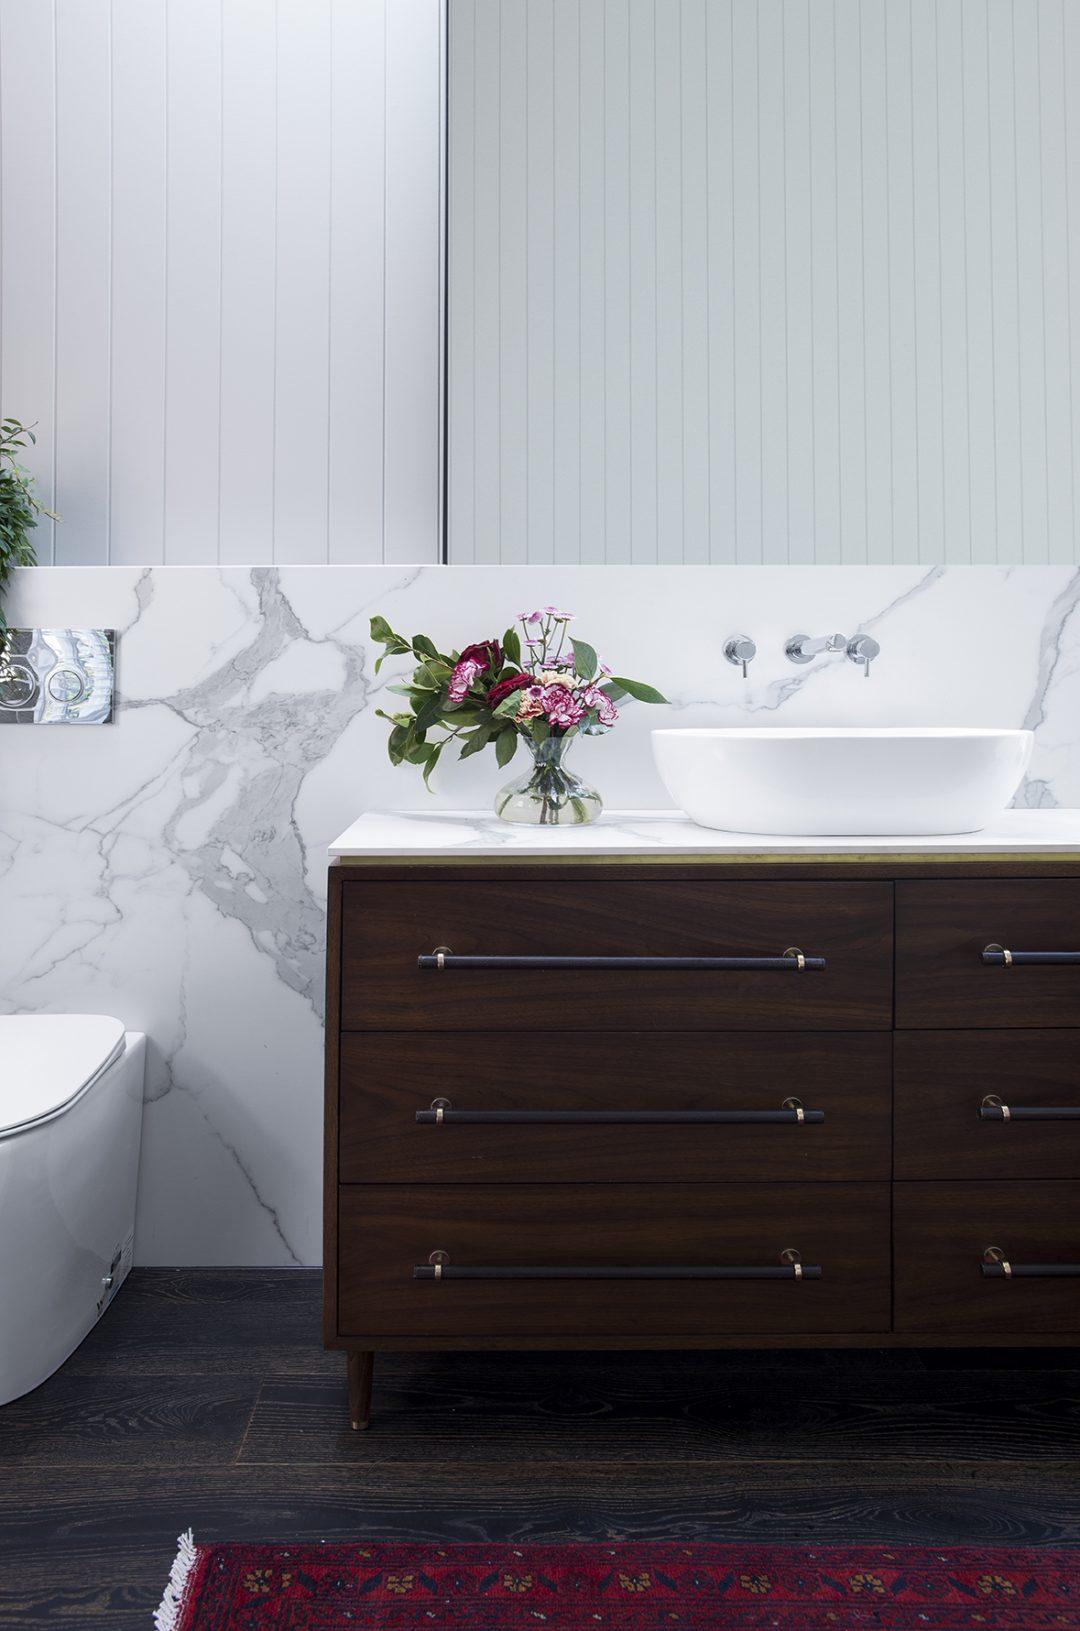 klassieke badkamers voorbeelden micheal en carlene